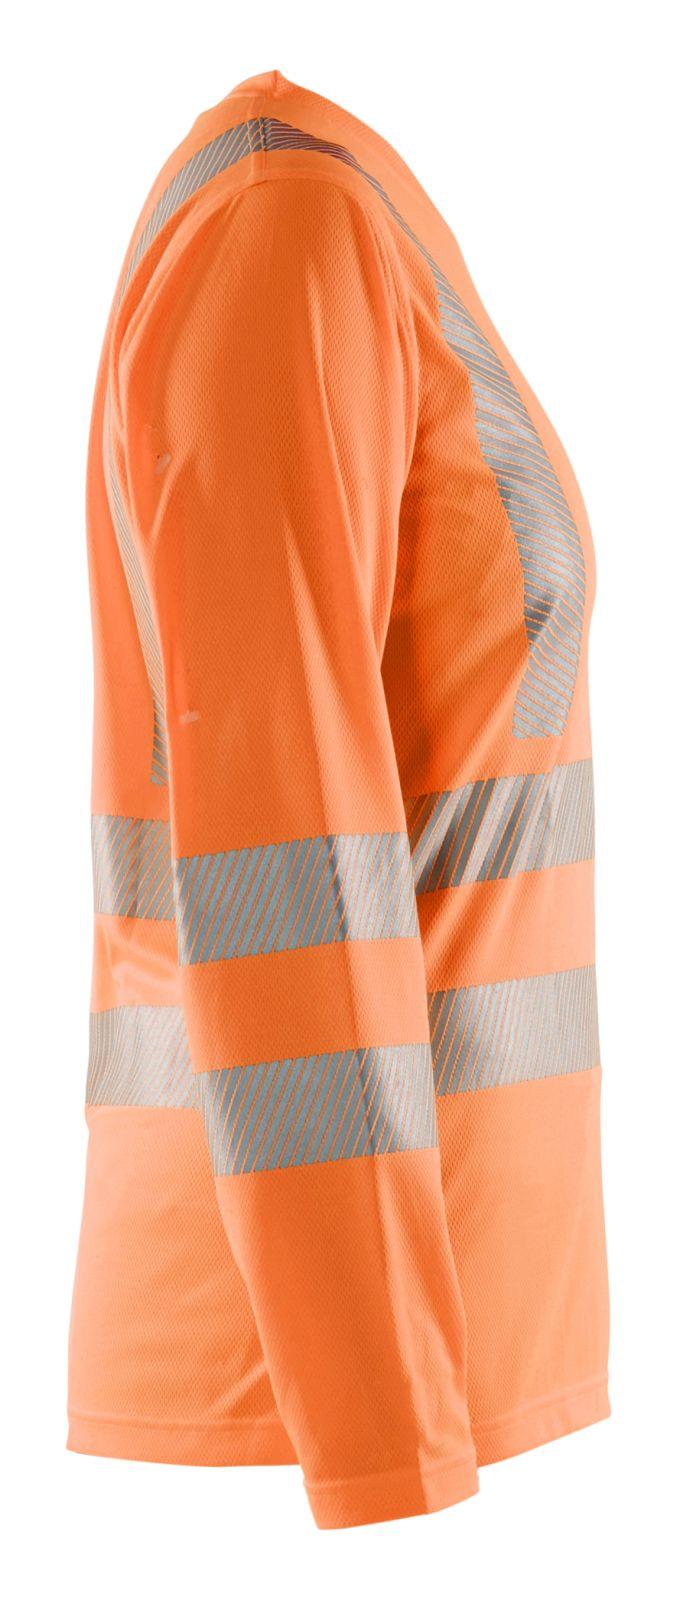 Blaklader Dames t-shirts 34851013 High Vis UPF40+ UV fluo-oranje(5300)